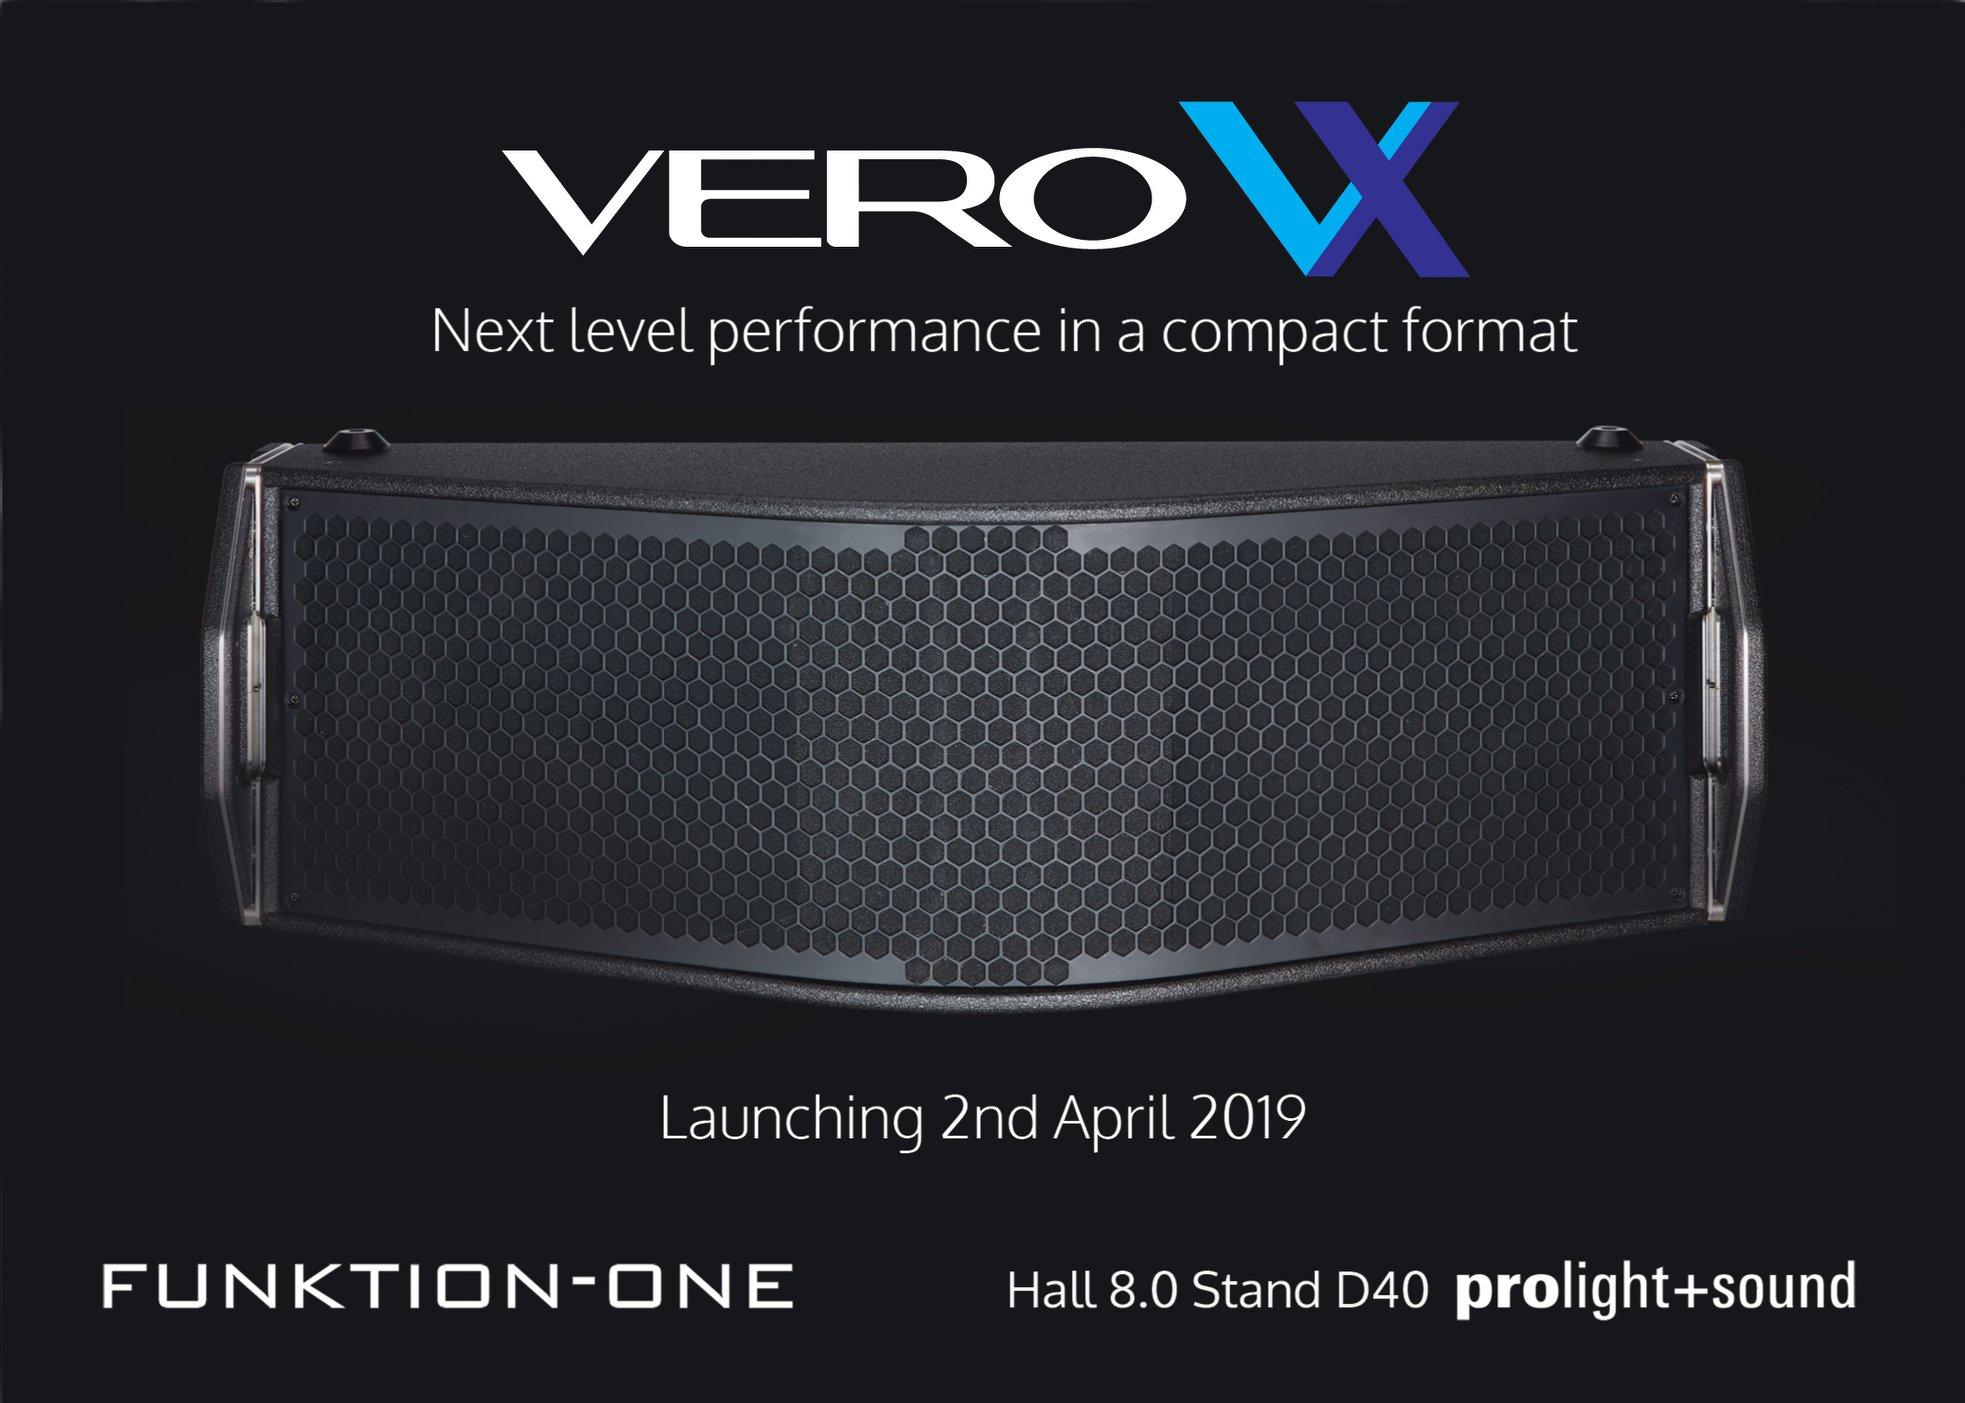 Vero VX Debuut Op De Prolight+Sound